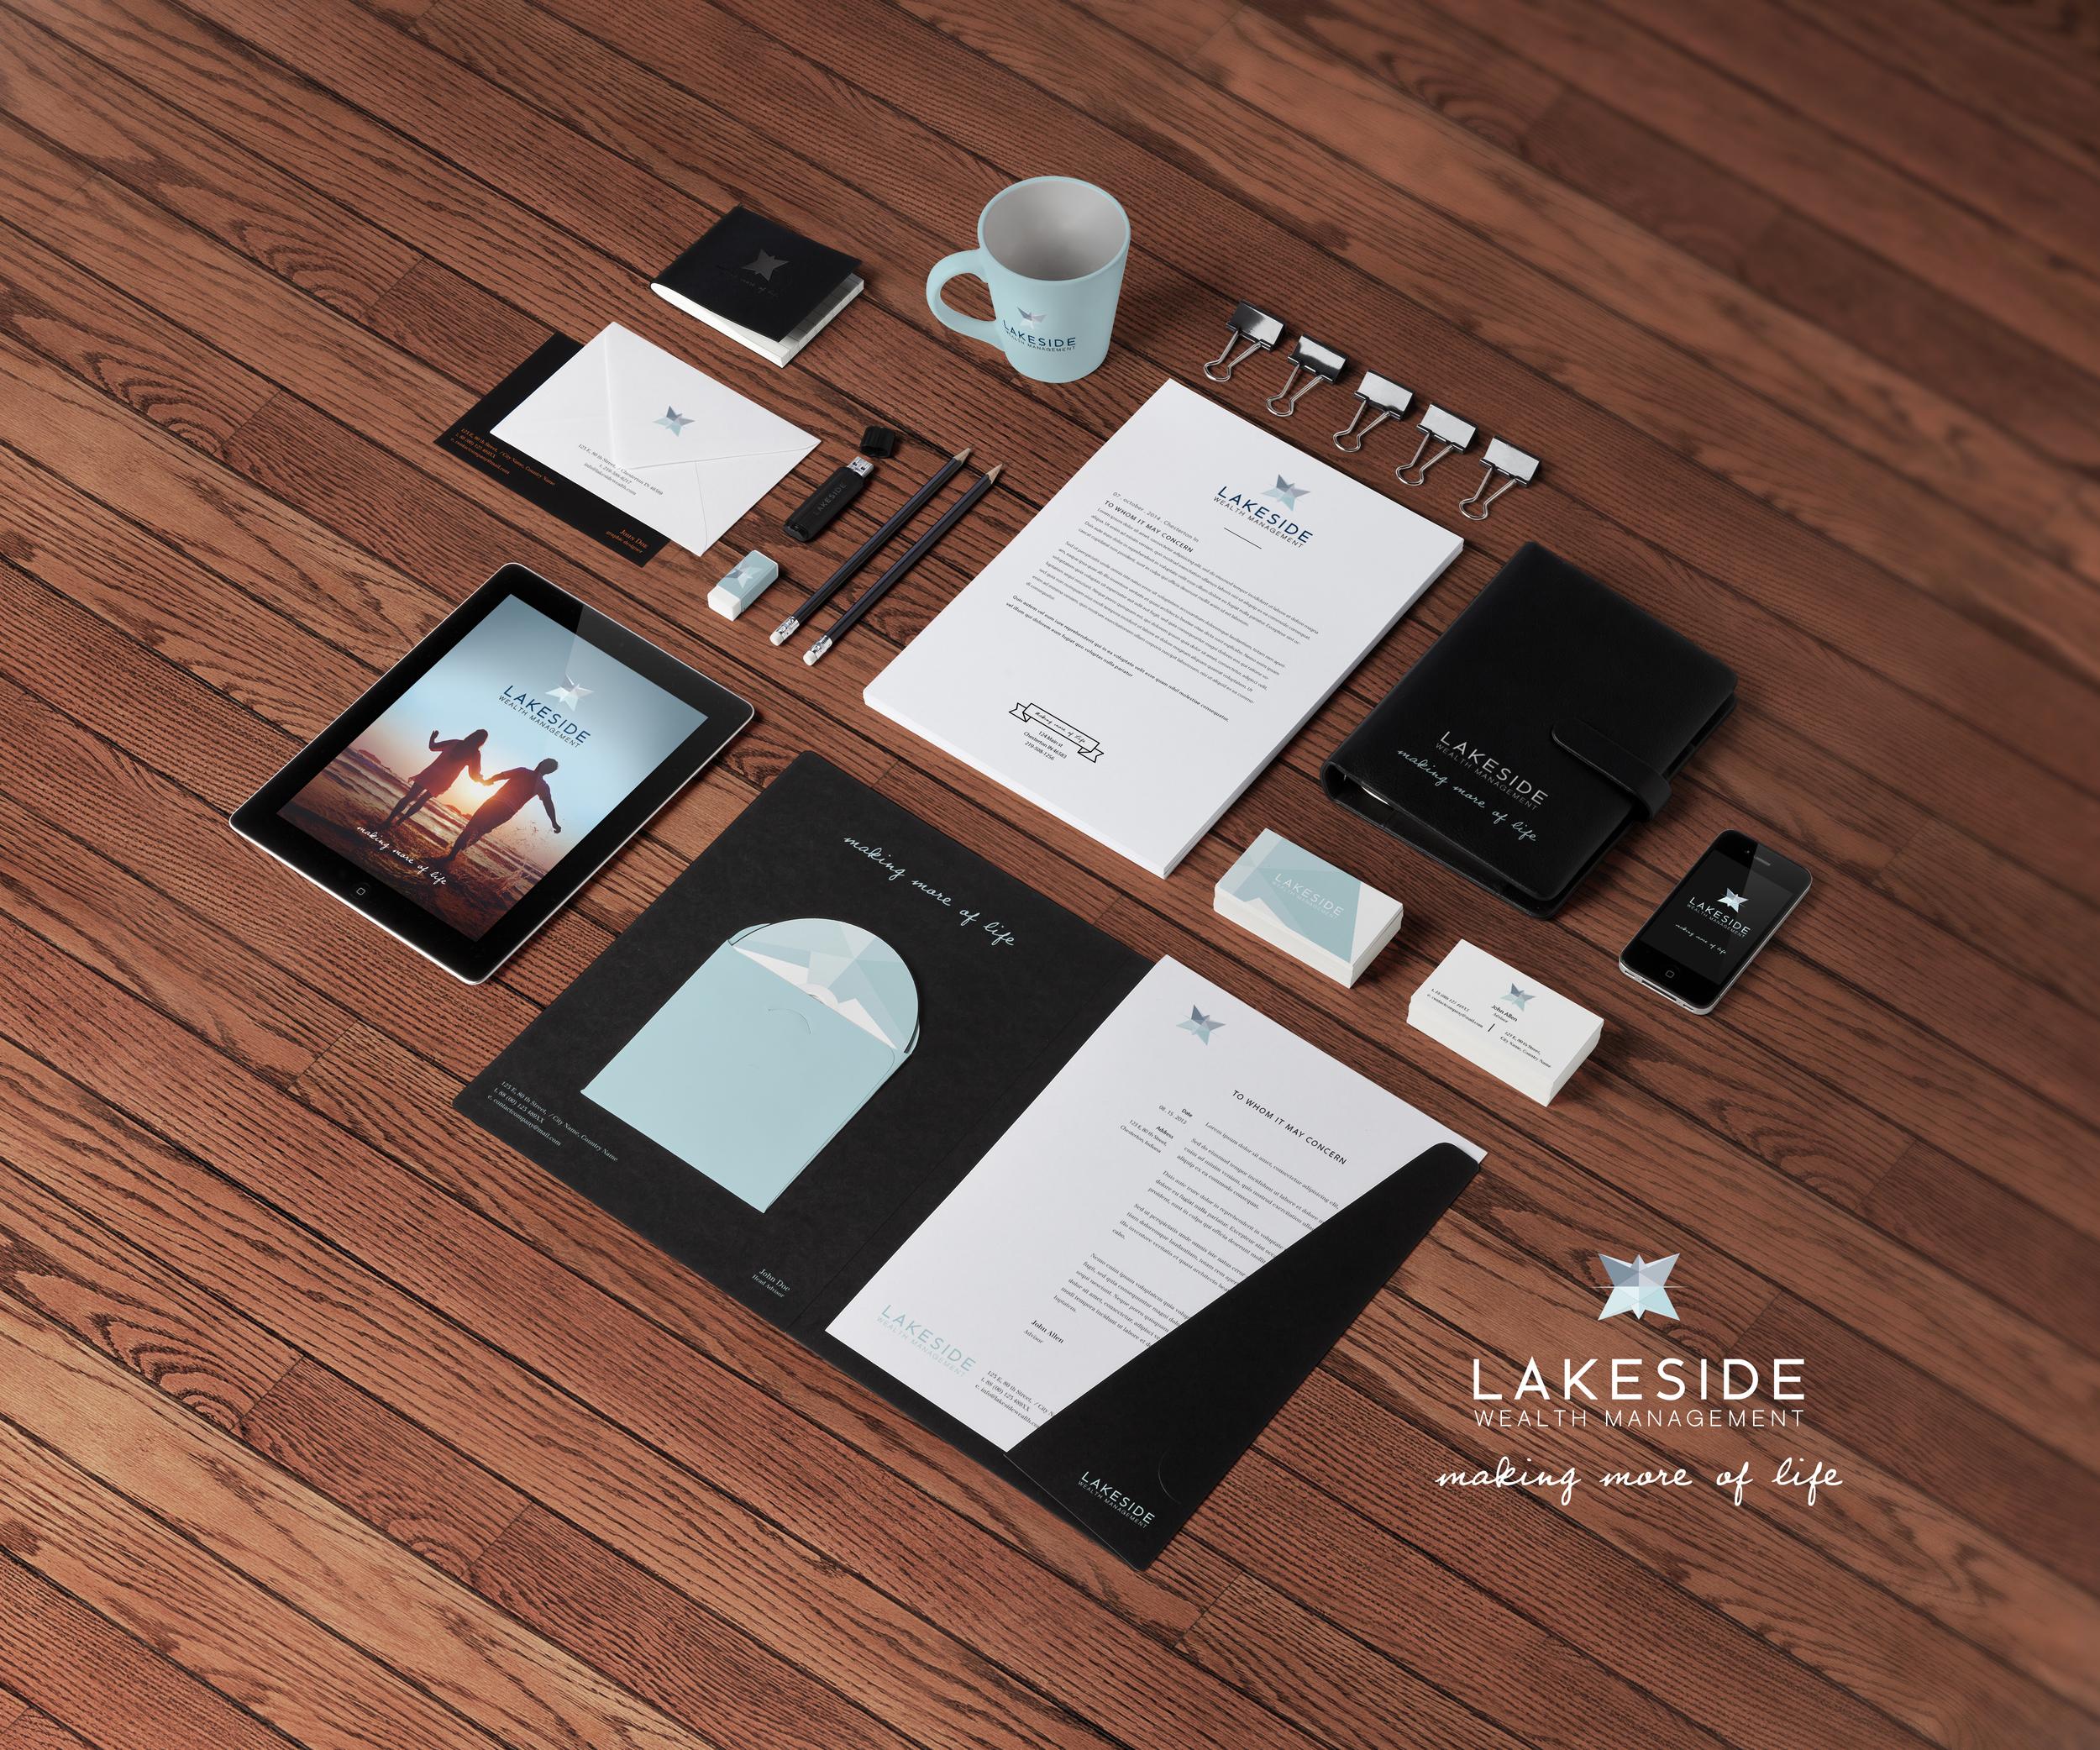 Lakeside Wealth Management